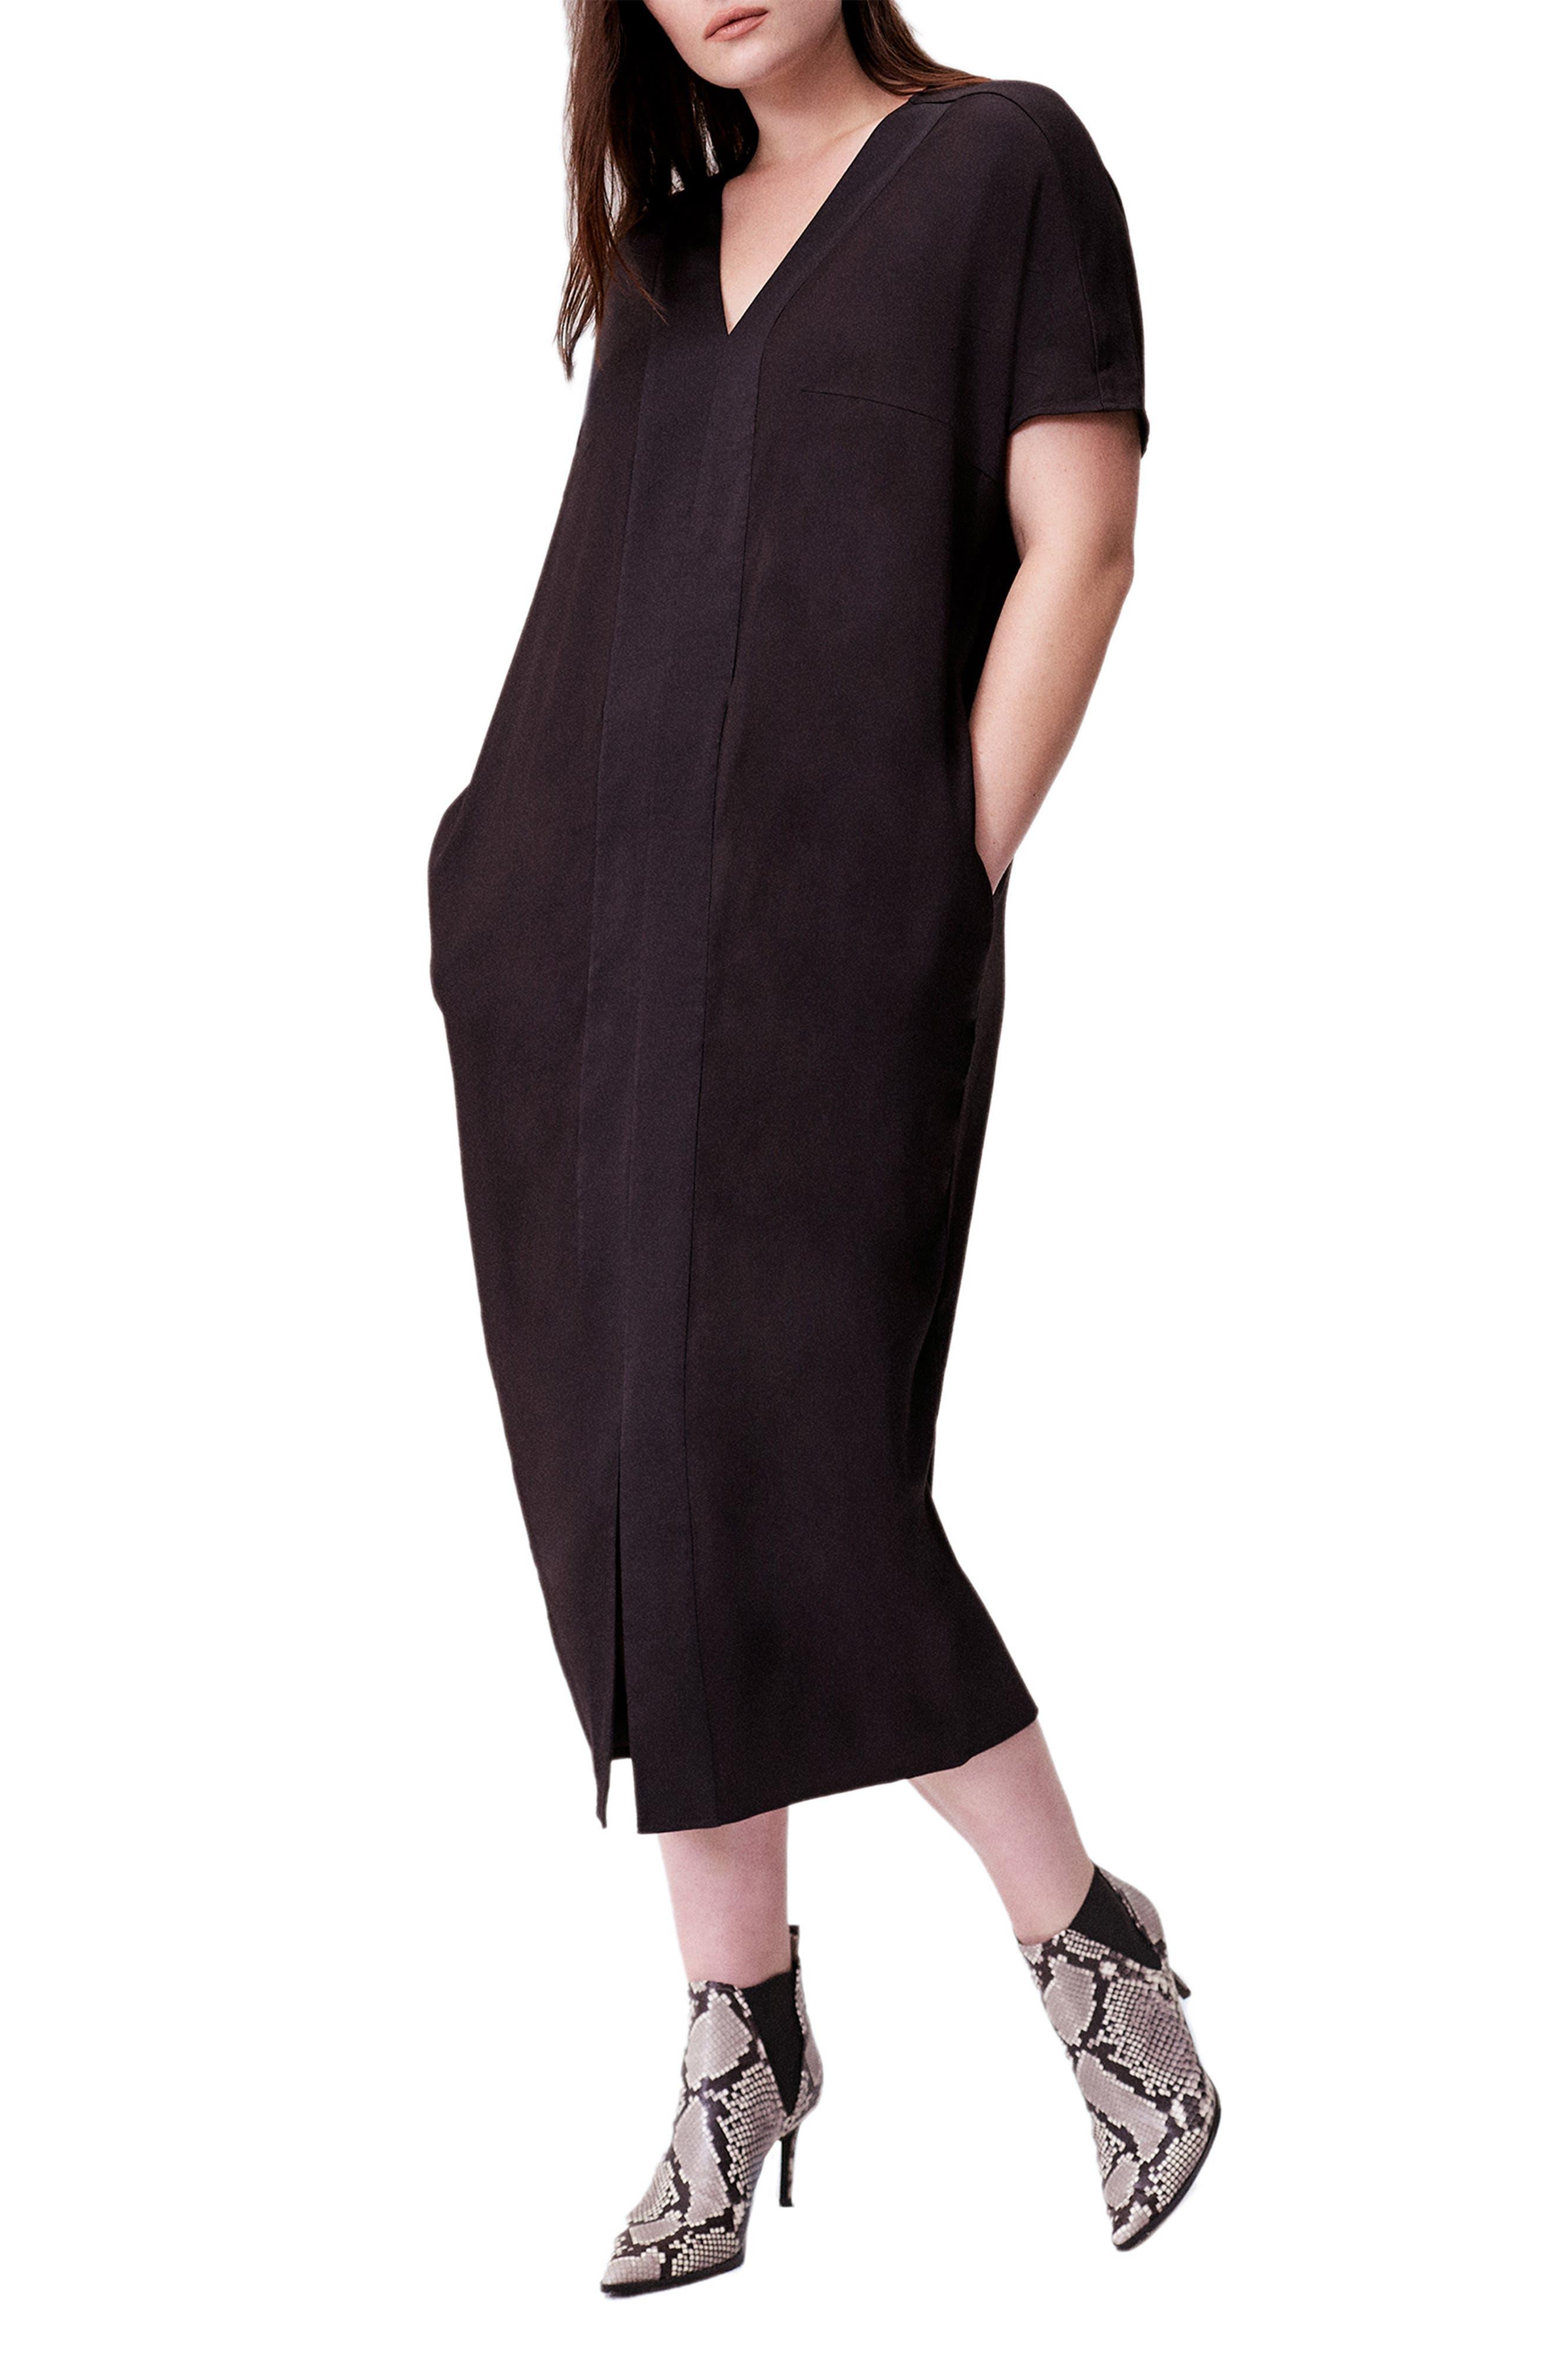 UNIVERSAL STANDARD, Crosby Caftan Dress, Main thumbnail 1, color, BLACK